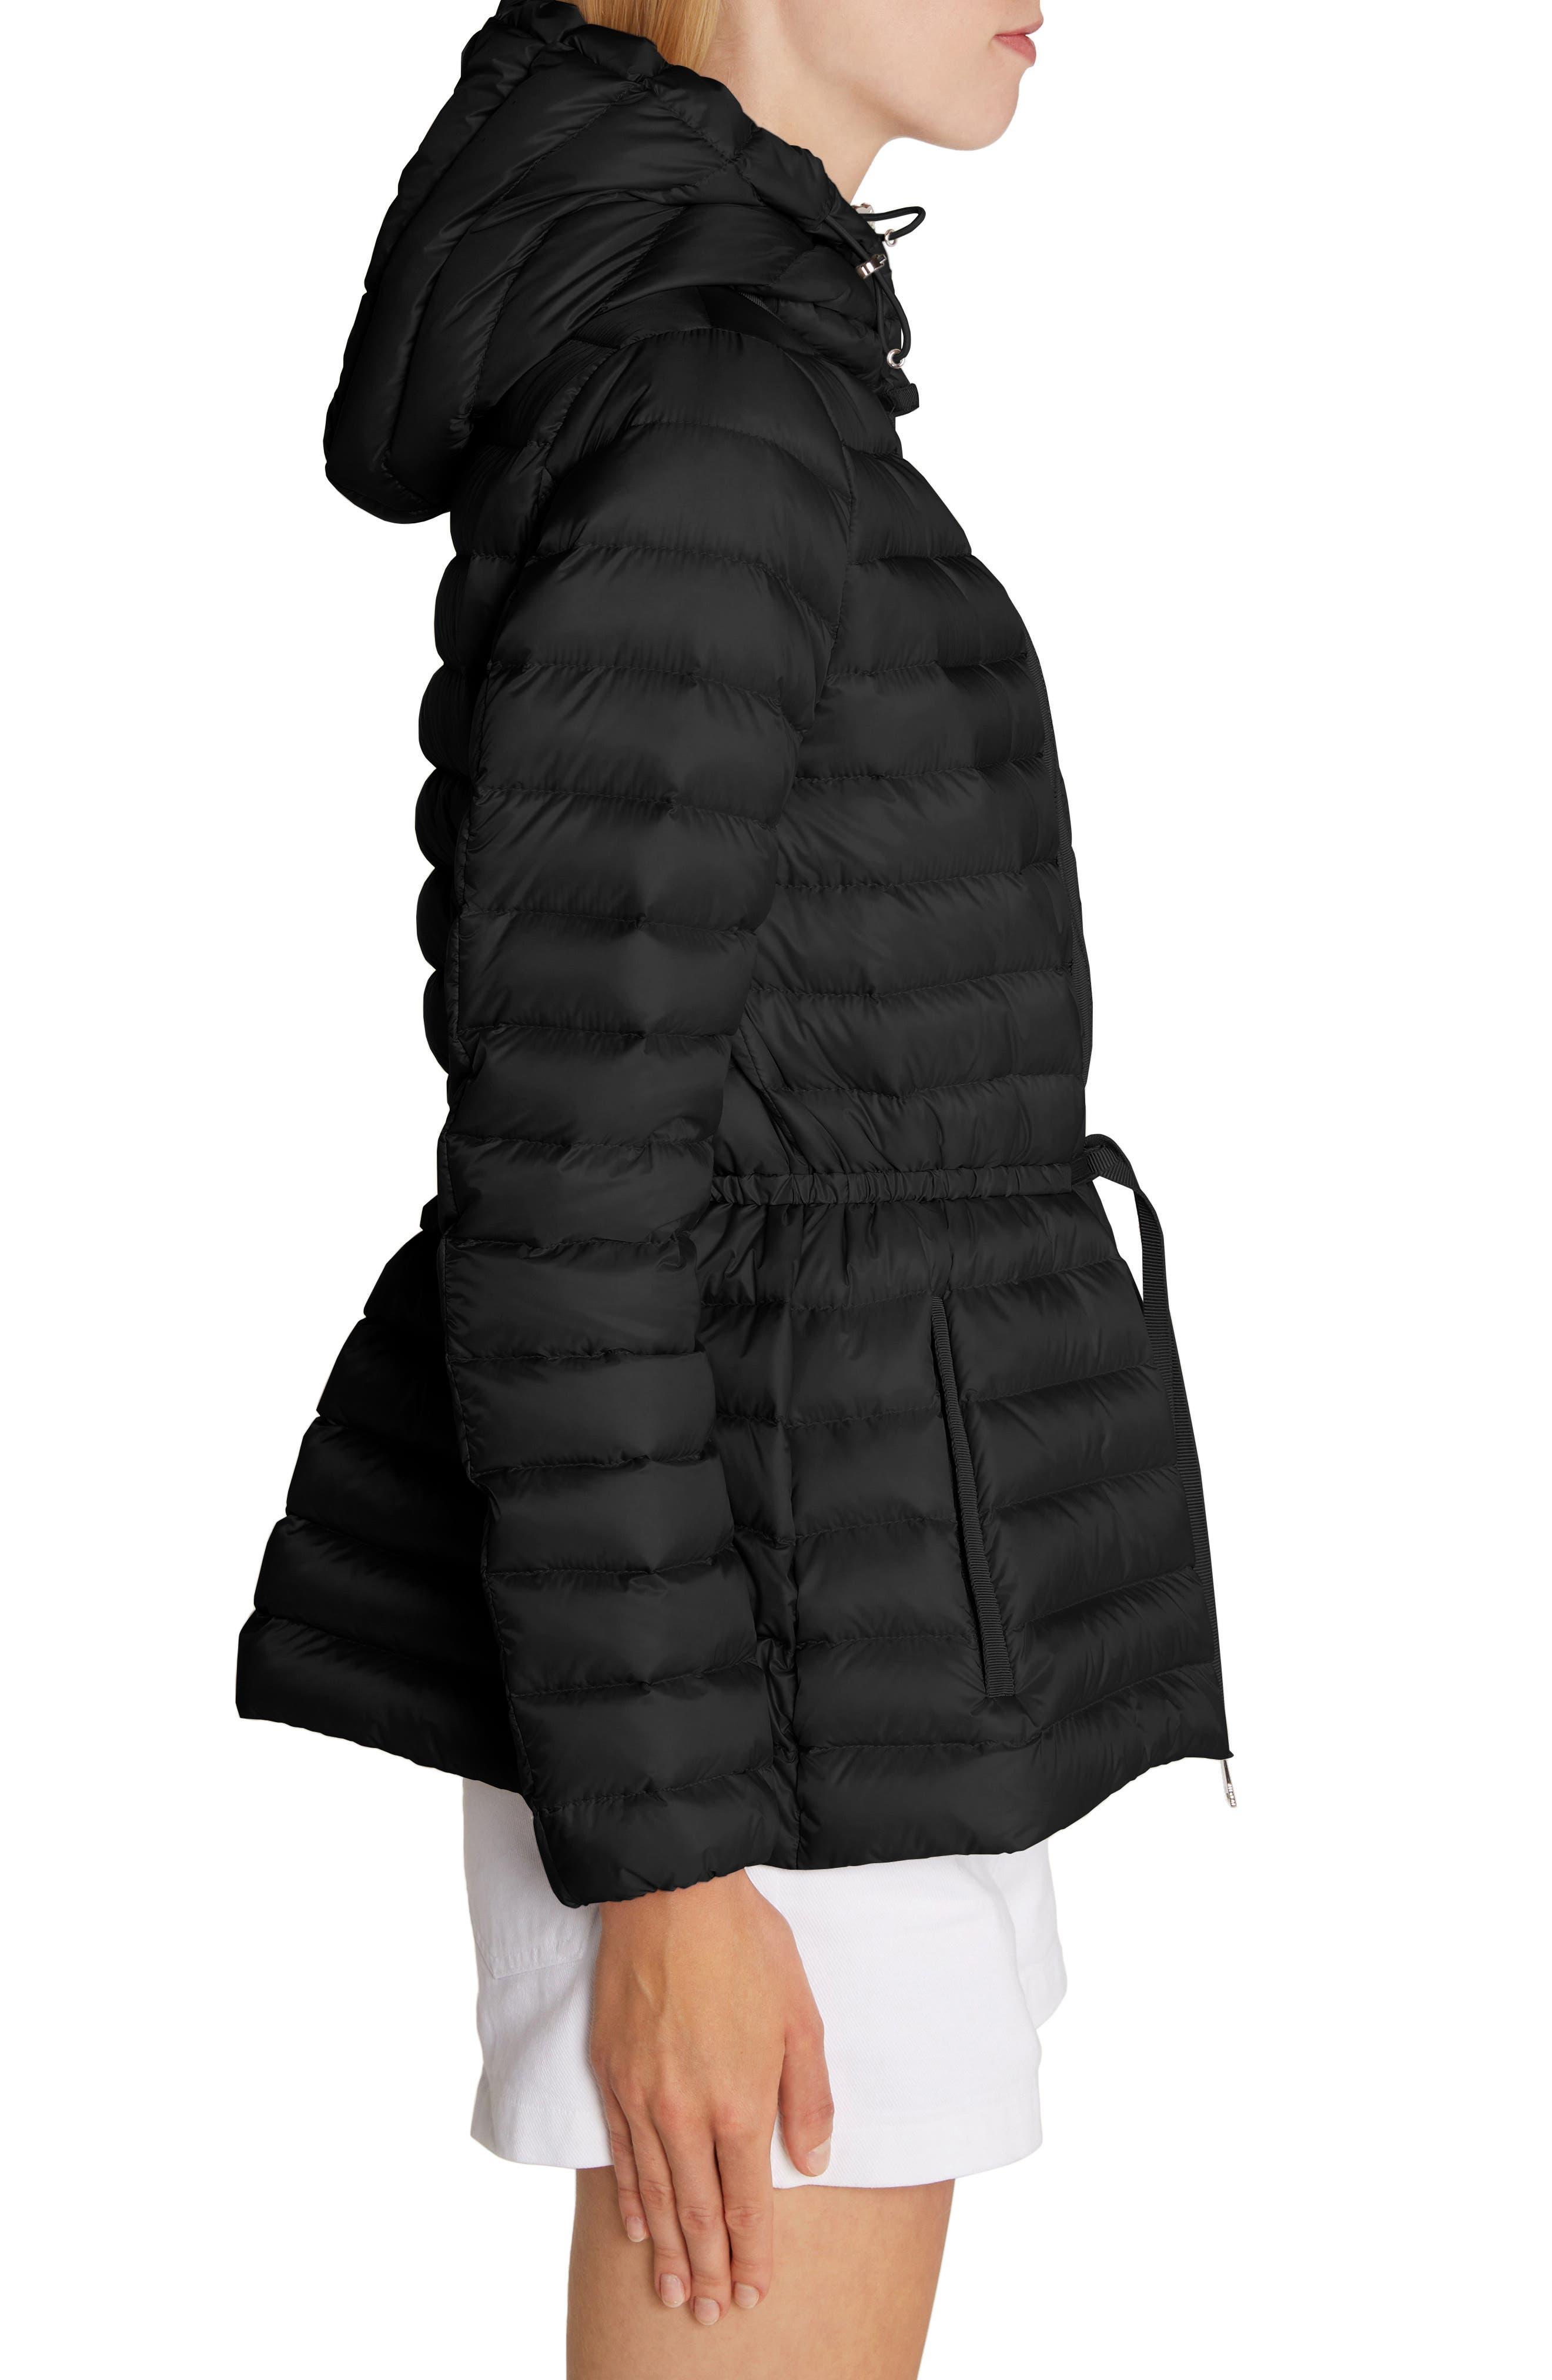 MONCLER, Raie Tie Waist Hooded Down Coat, Alternate thumbnail 3, color, BLACK